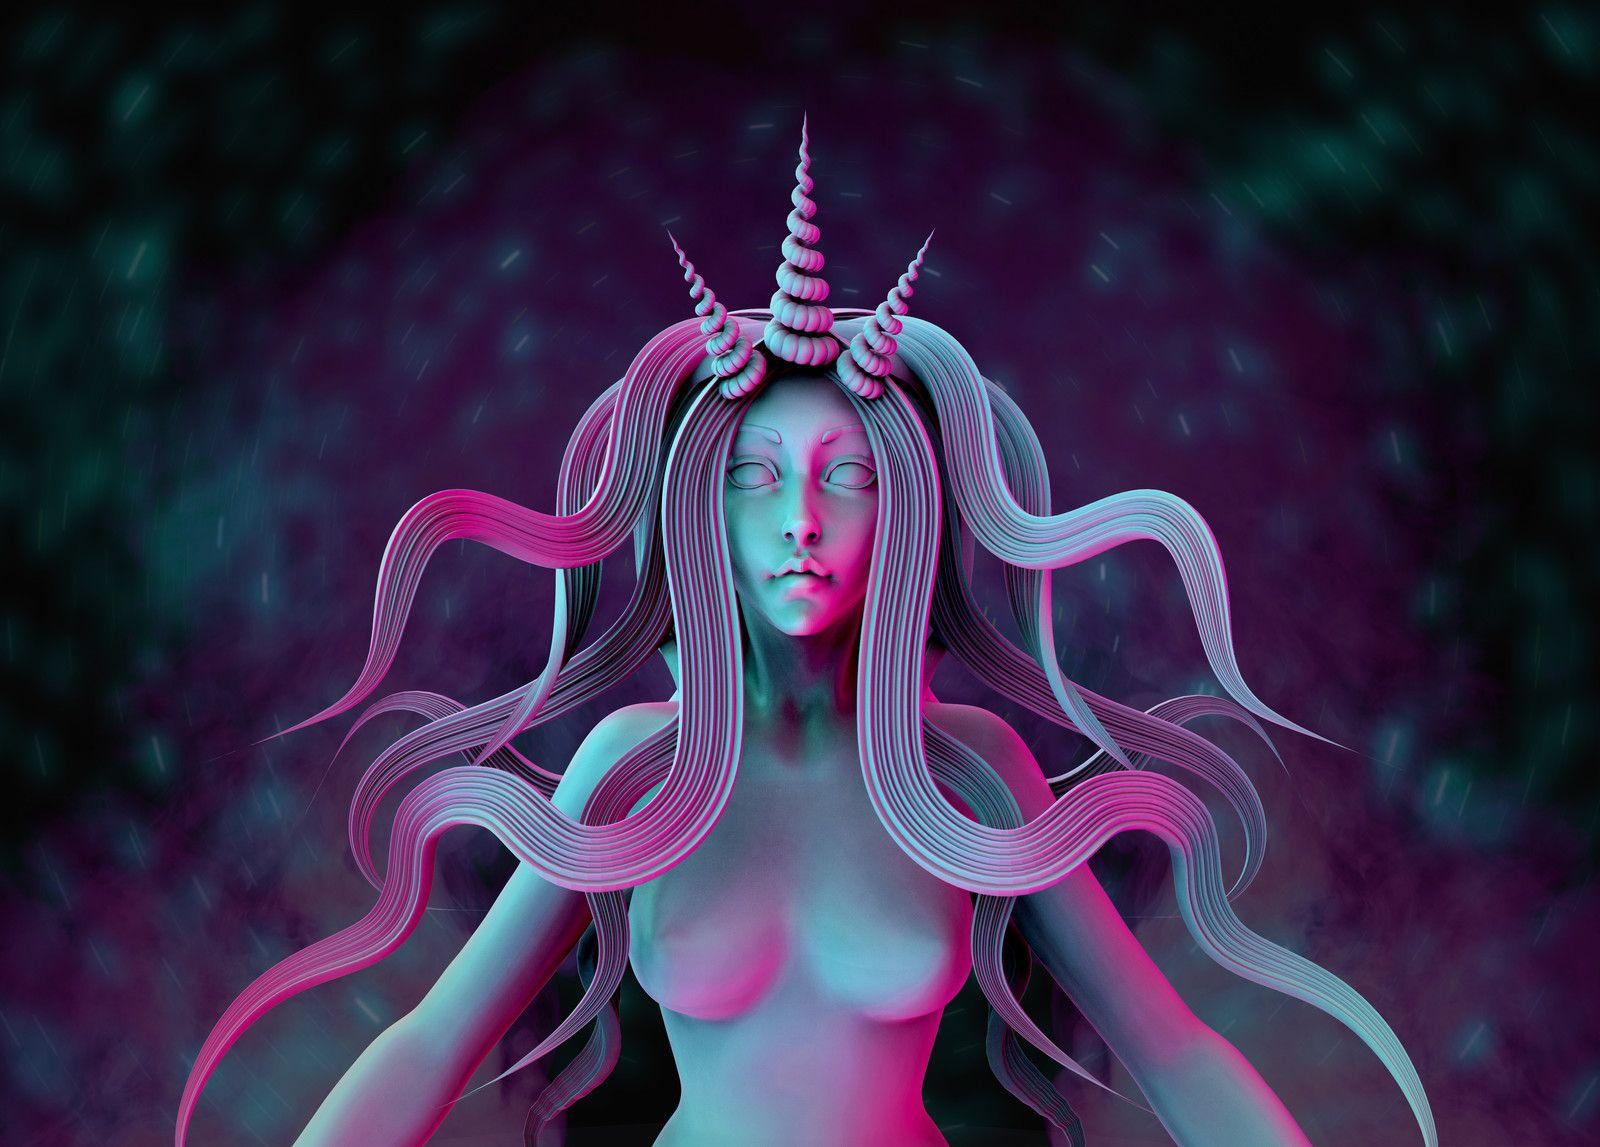 Speedsculpted Mermaid, Ksenia Shumikhina on ArtStation at https://www.artstation.com/artwork/xxzr1